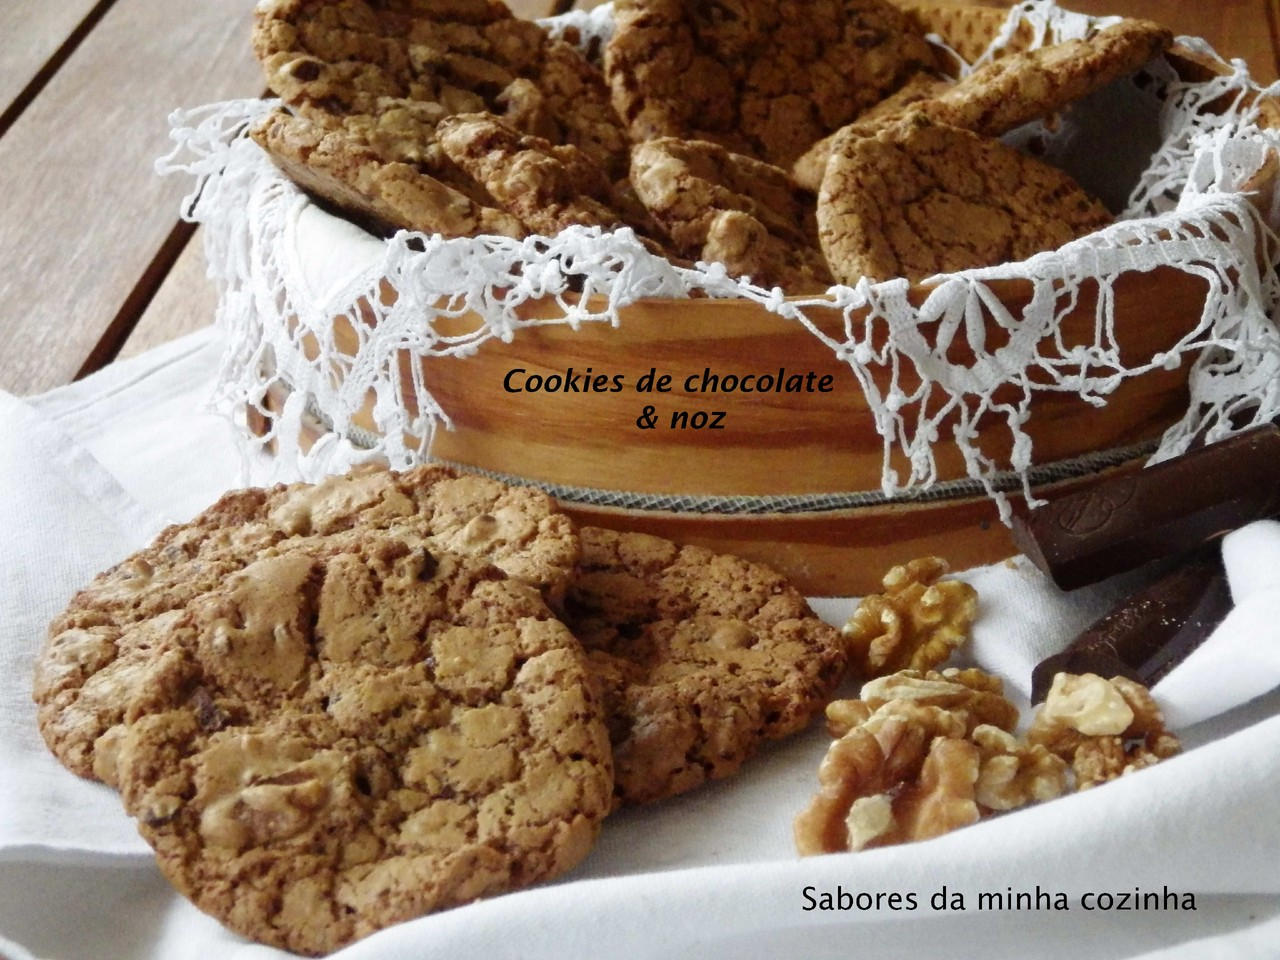 IMGP4410-Cookies de chocolate & noz-Blog.JPG